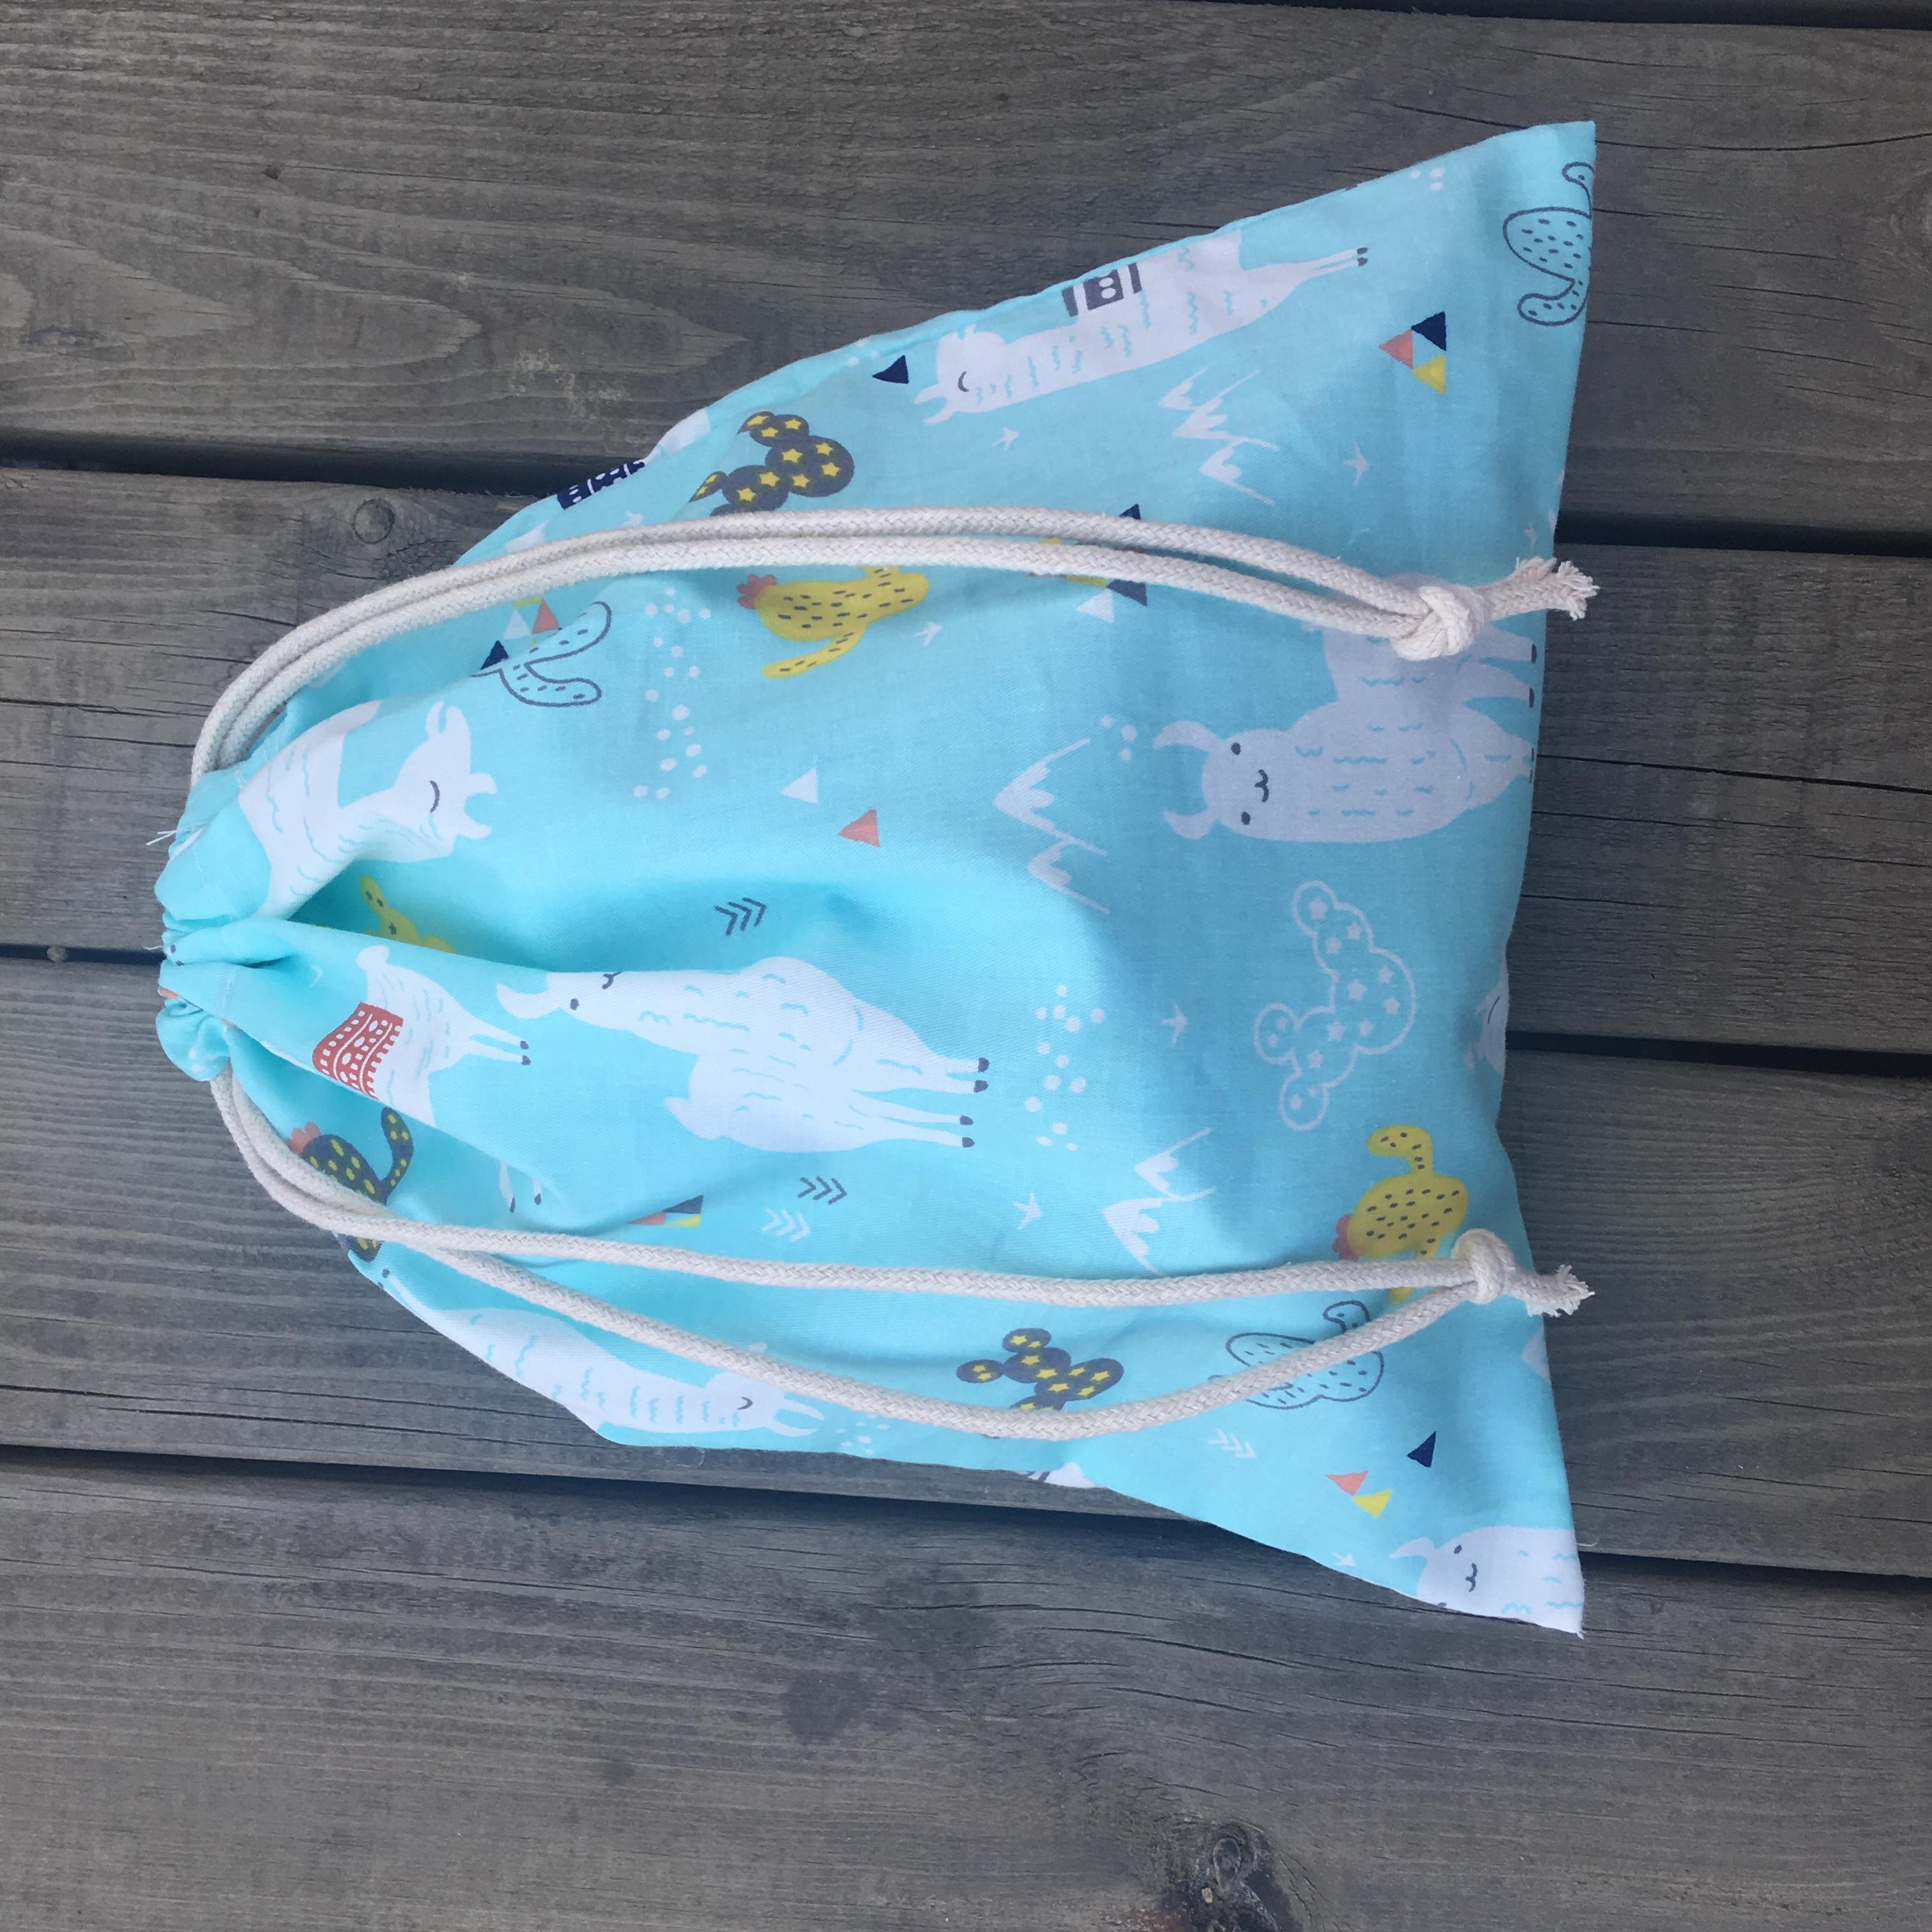 Cotton Twill Drawstring Multi-purpose Bag Party Gift Bag Cactus Animals Alpaca Blue Base YL74